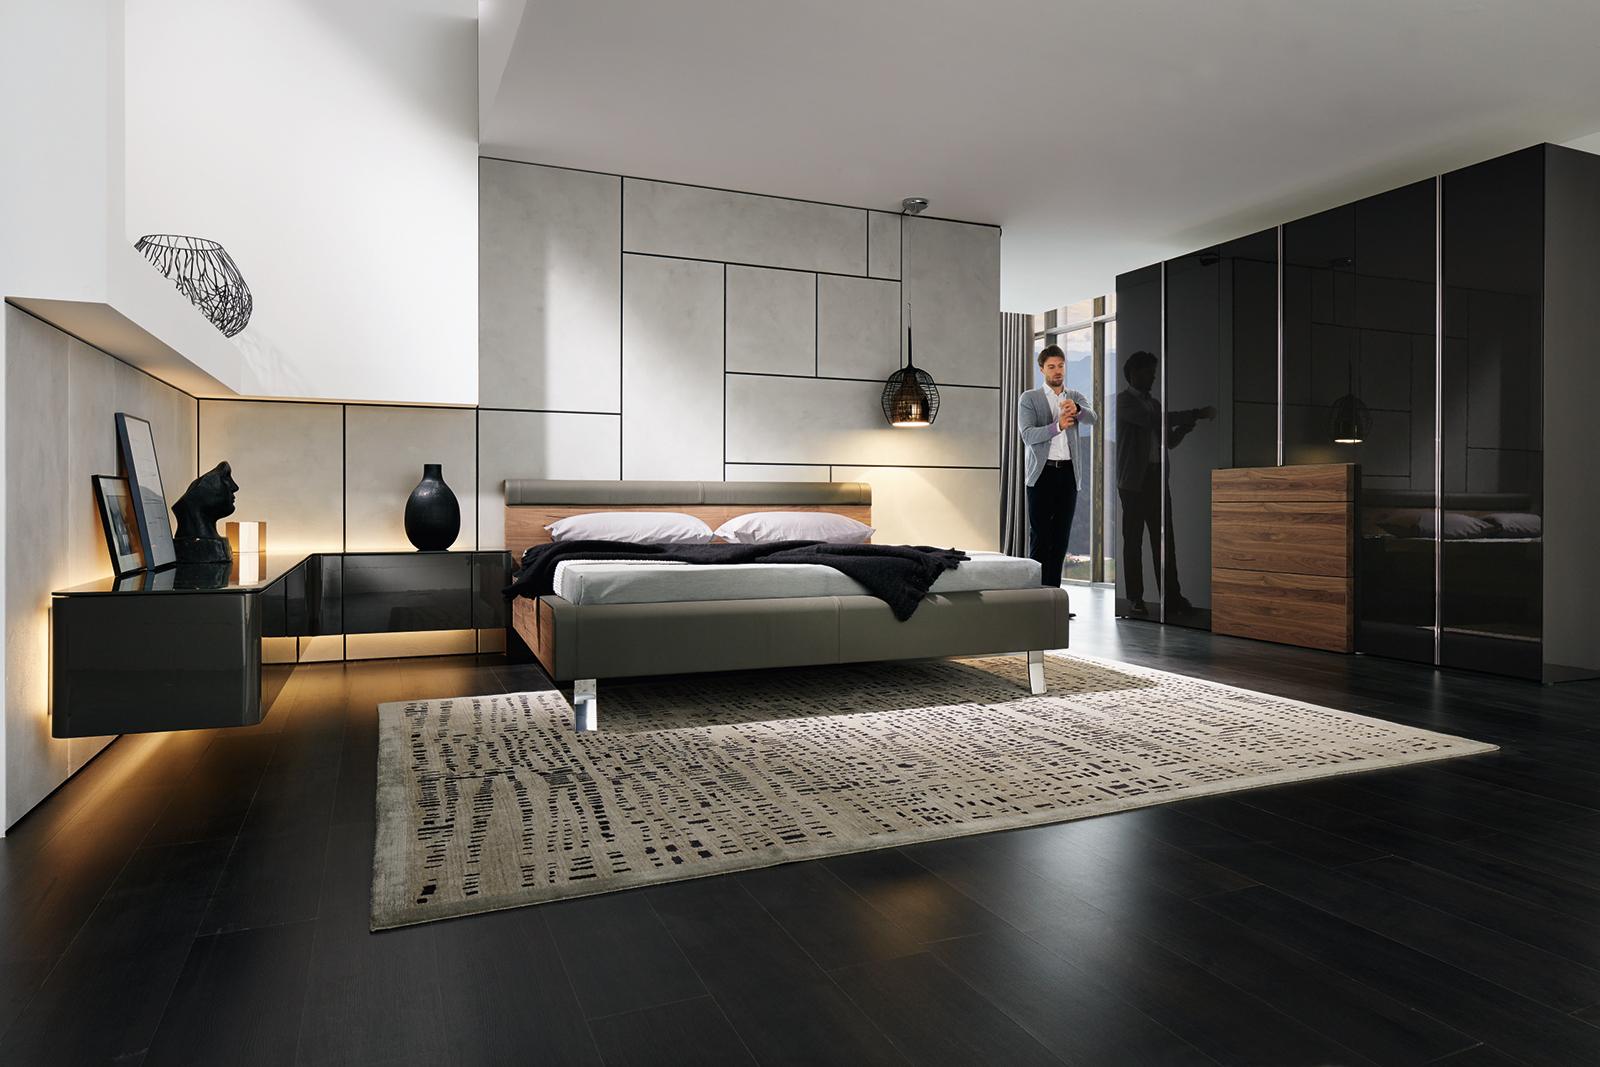 schlafzimmer treitinger m belhaus. Black Bedroom Furniture Sets. Home Design Ideas